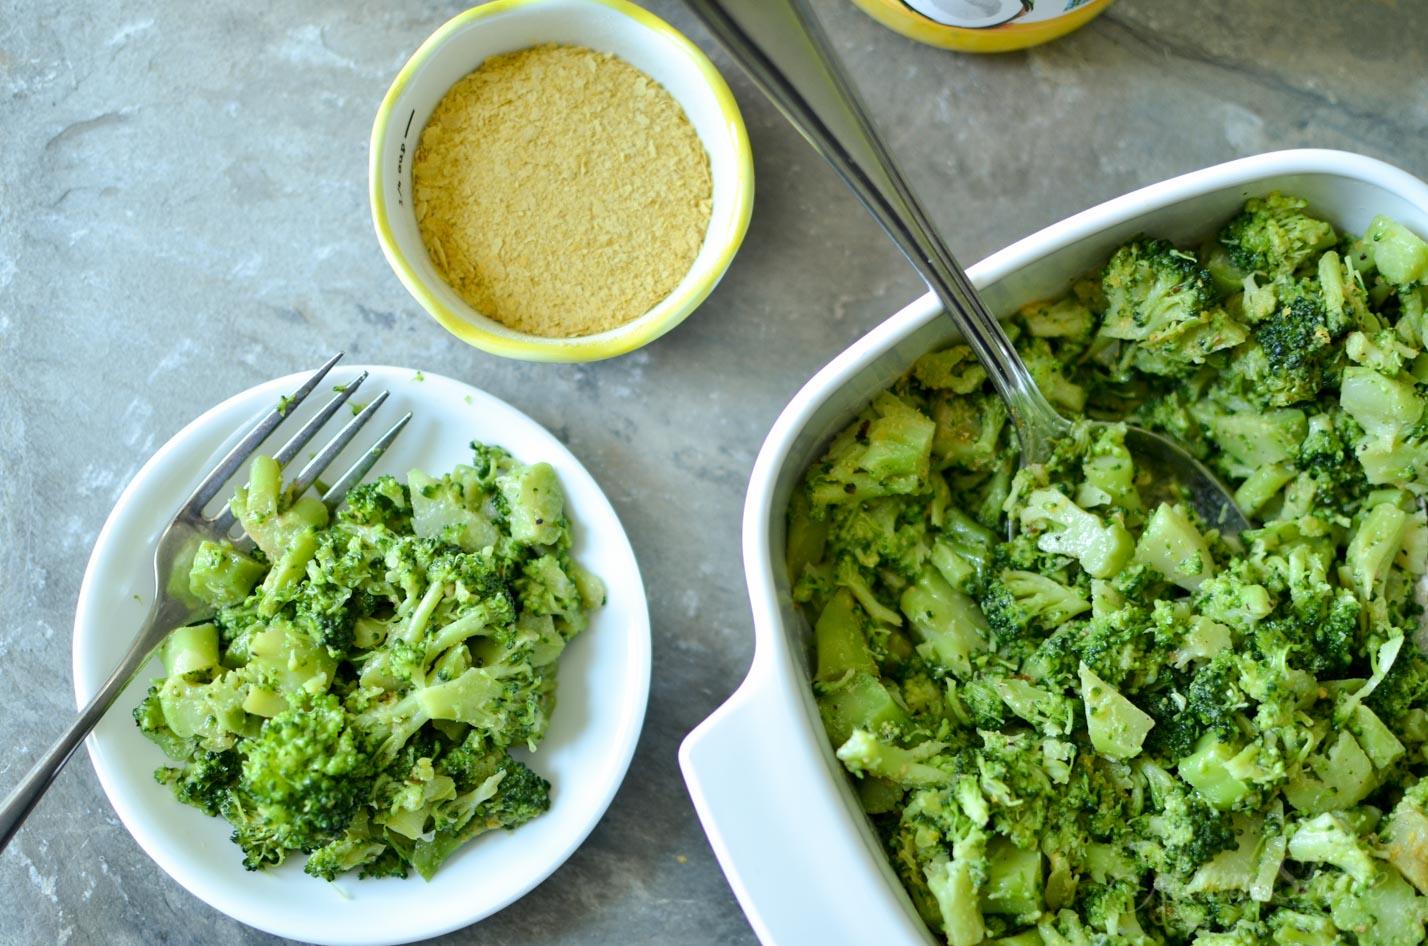 Buttery Lemon Pepper Broccoli - Dairy-Free, Gluten-Free, Nutritional Yeast